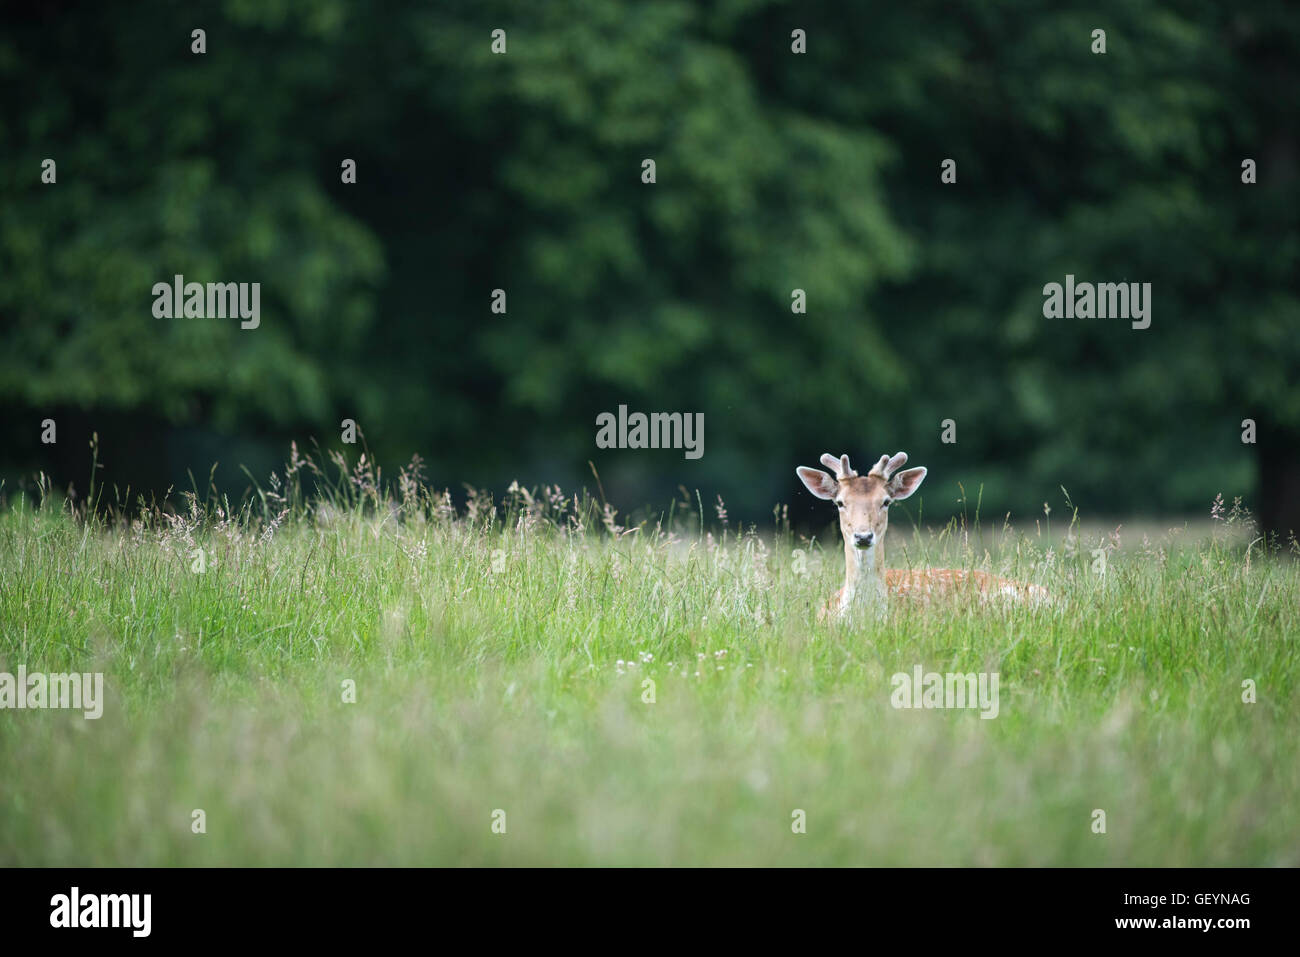 Fallow Deer in grass - Stock Image